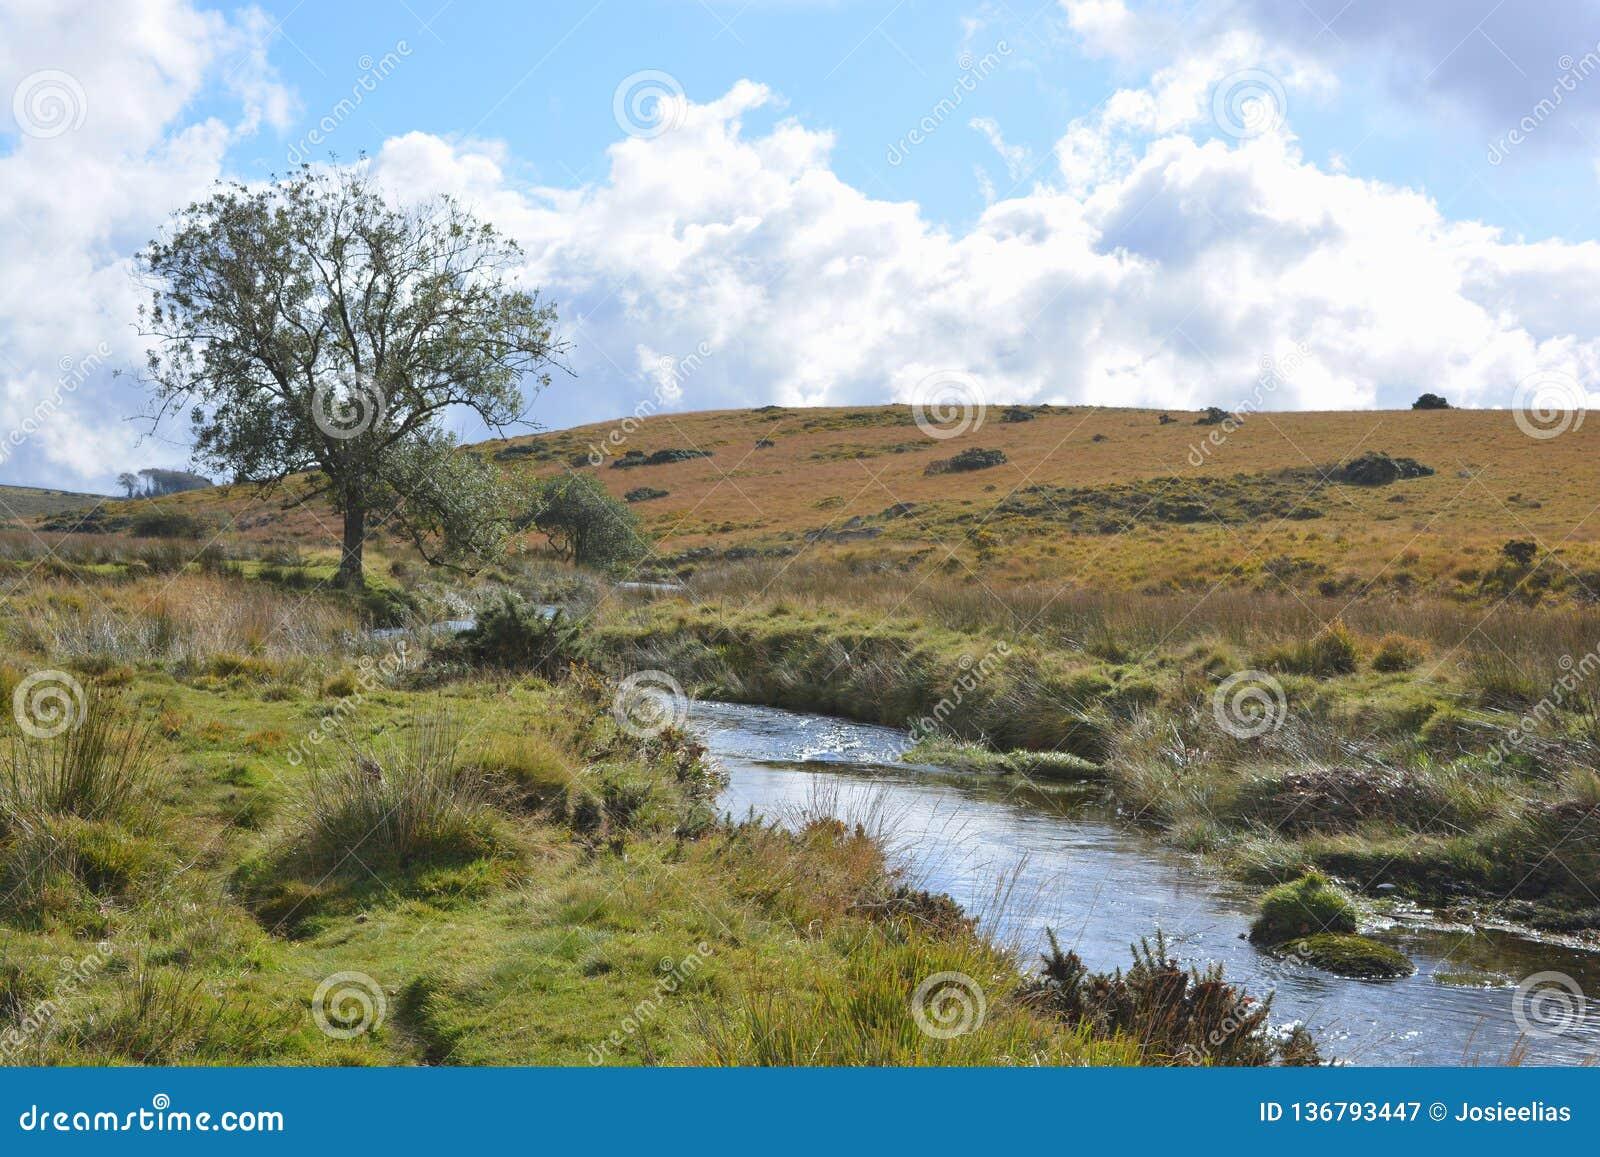 West Dart River near Two Bridges, Dartmoor National Park, Devon, England